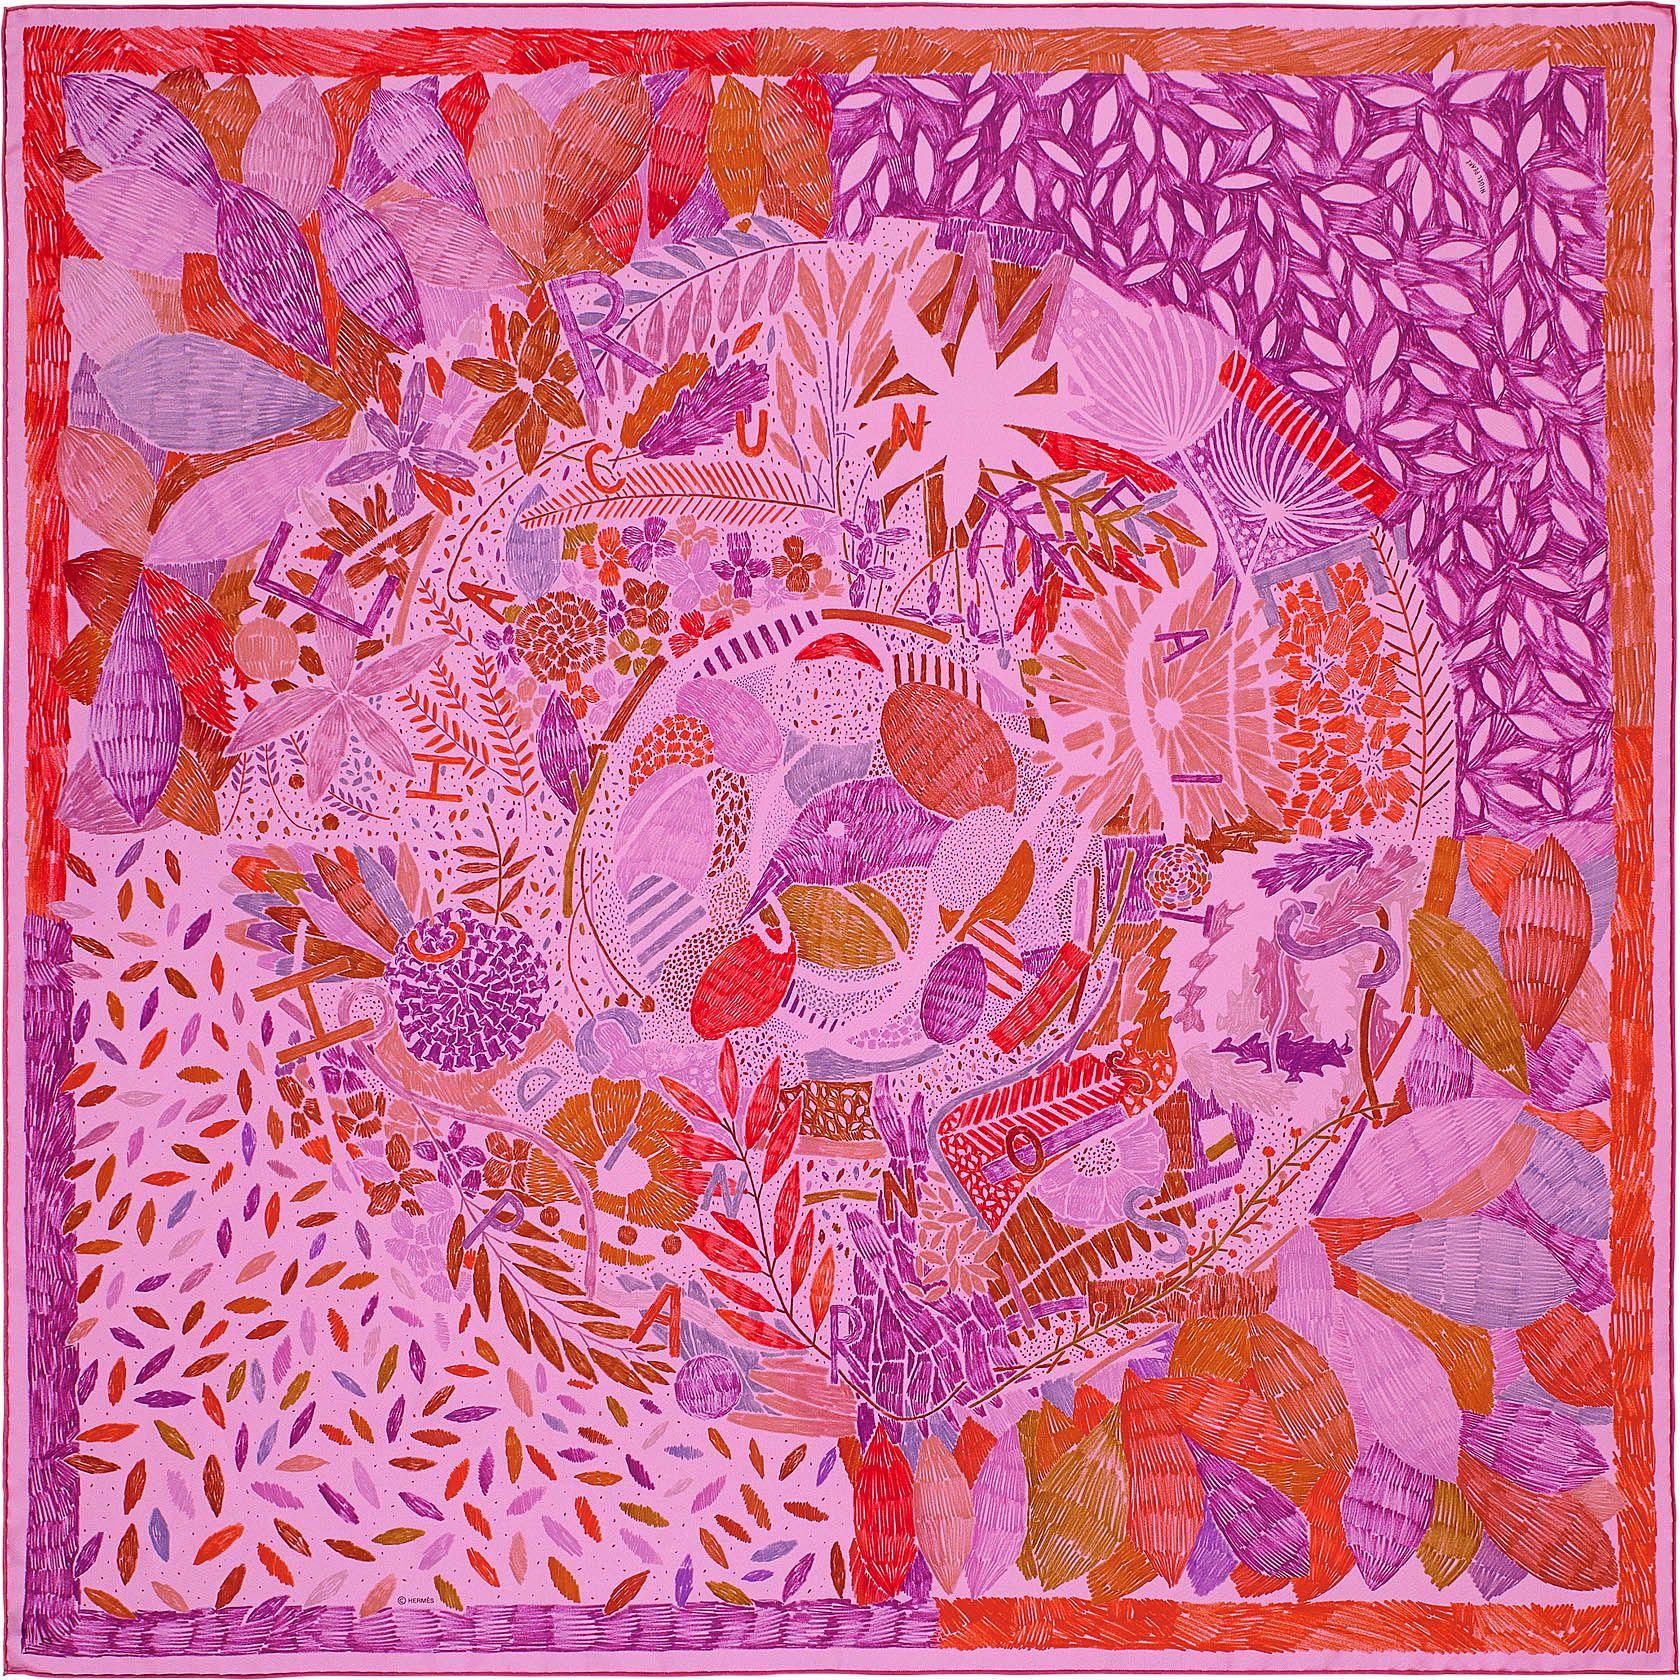 Hermès Chacun Fait Son Nid, signé Nigel Peake   Carrés   Pinterest ... ed59ba389f1